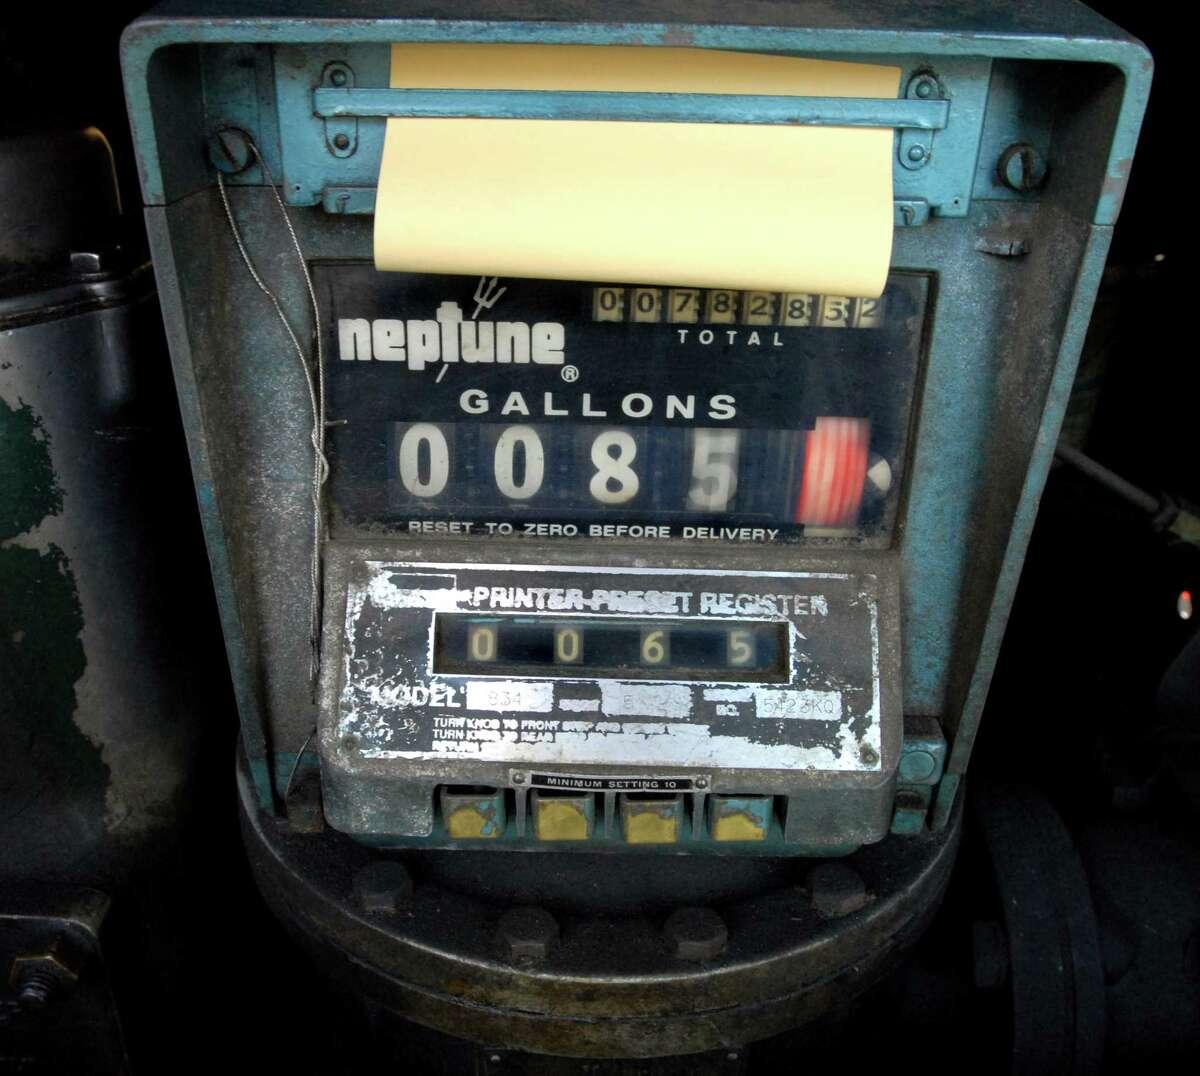 (ms093009)-The meter registers gallons as Nick Libretti fills an oil tank in East Haven. Melanie Stengel/Register